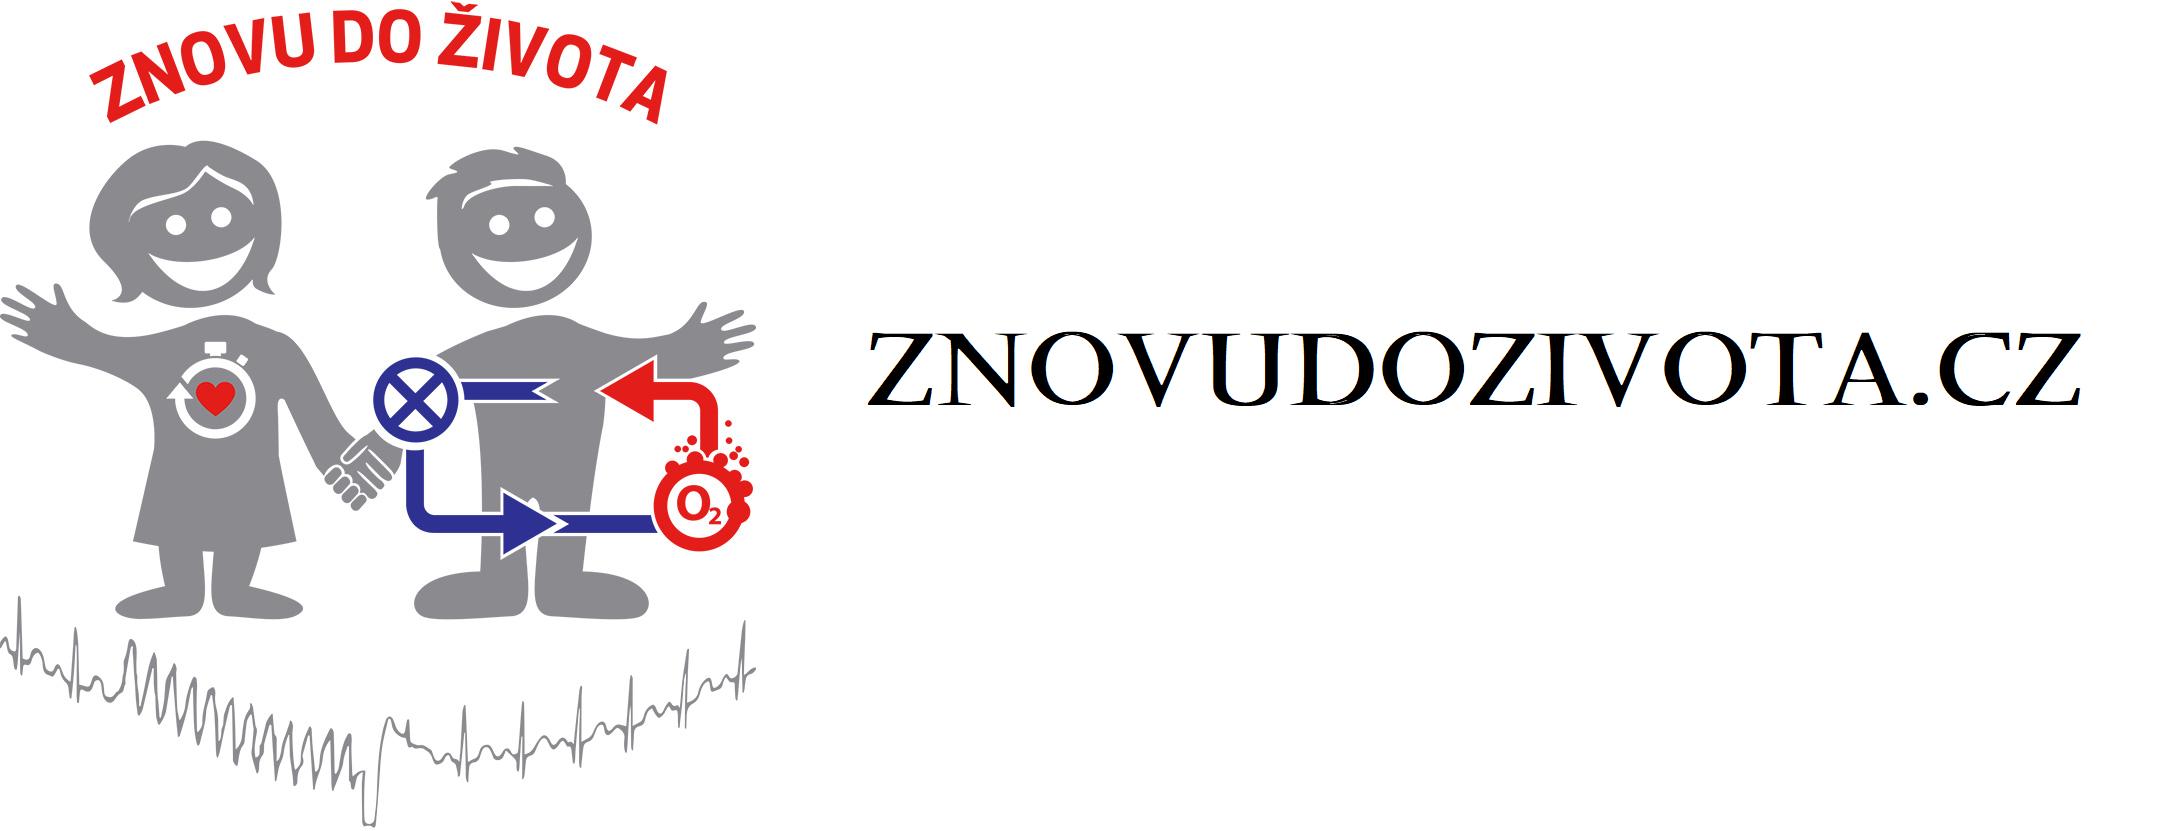 Znovudozivota.cz